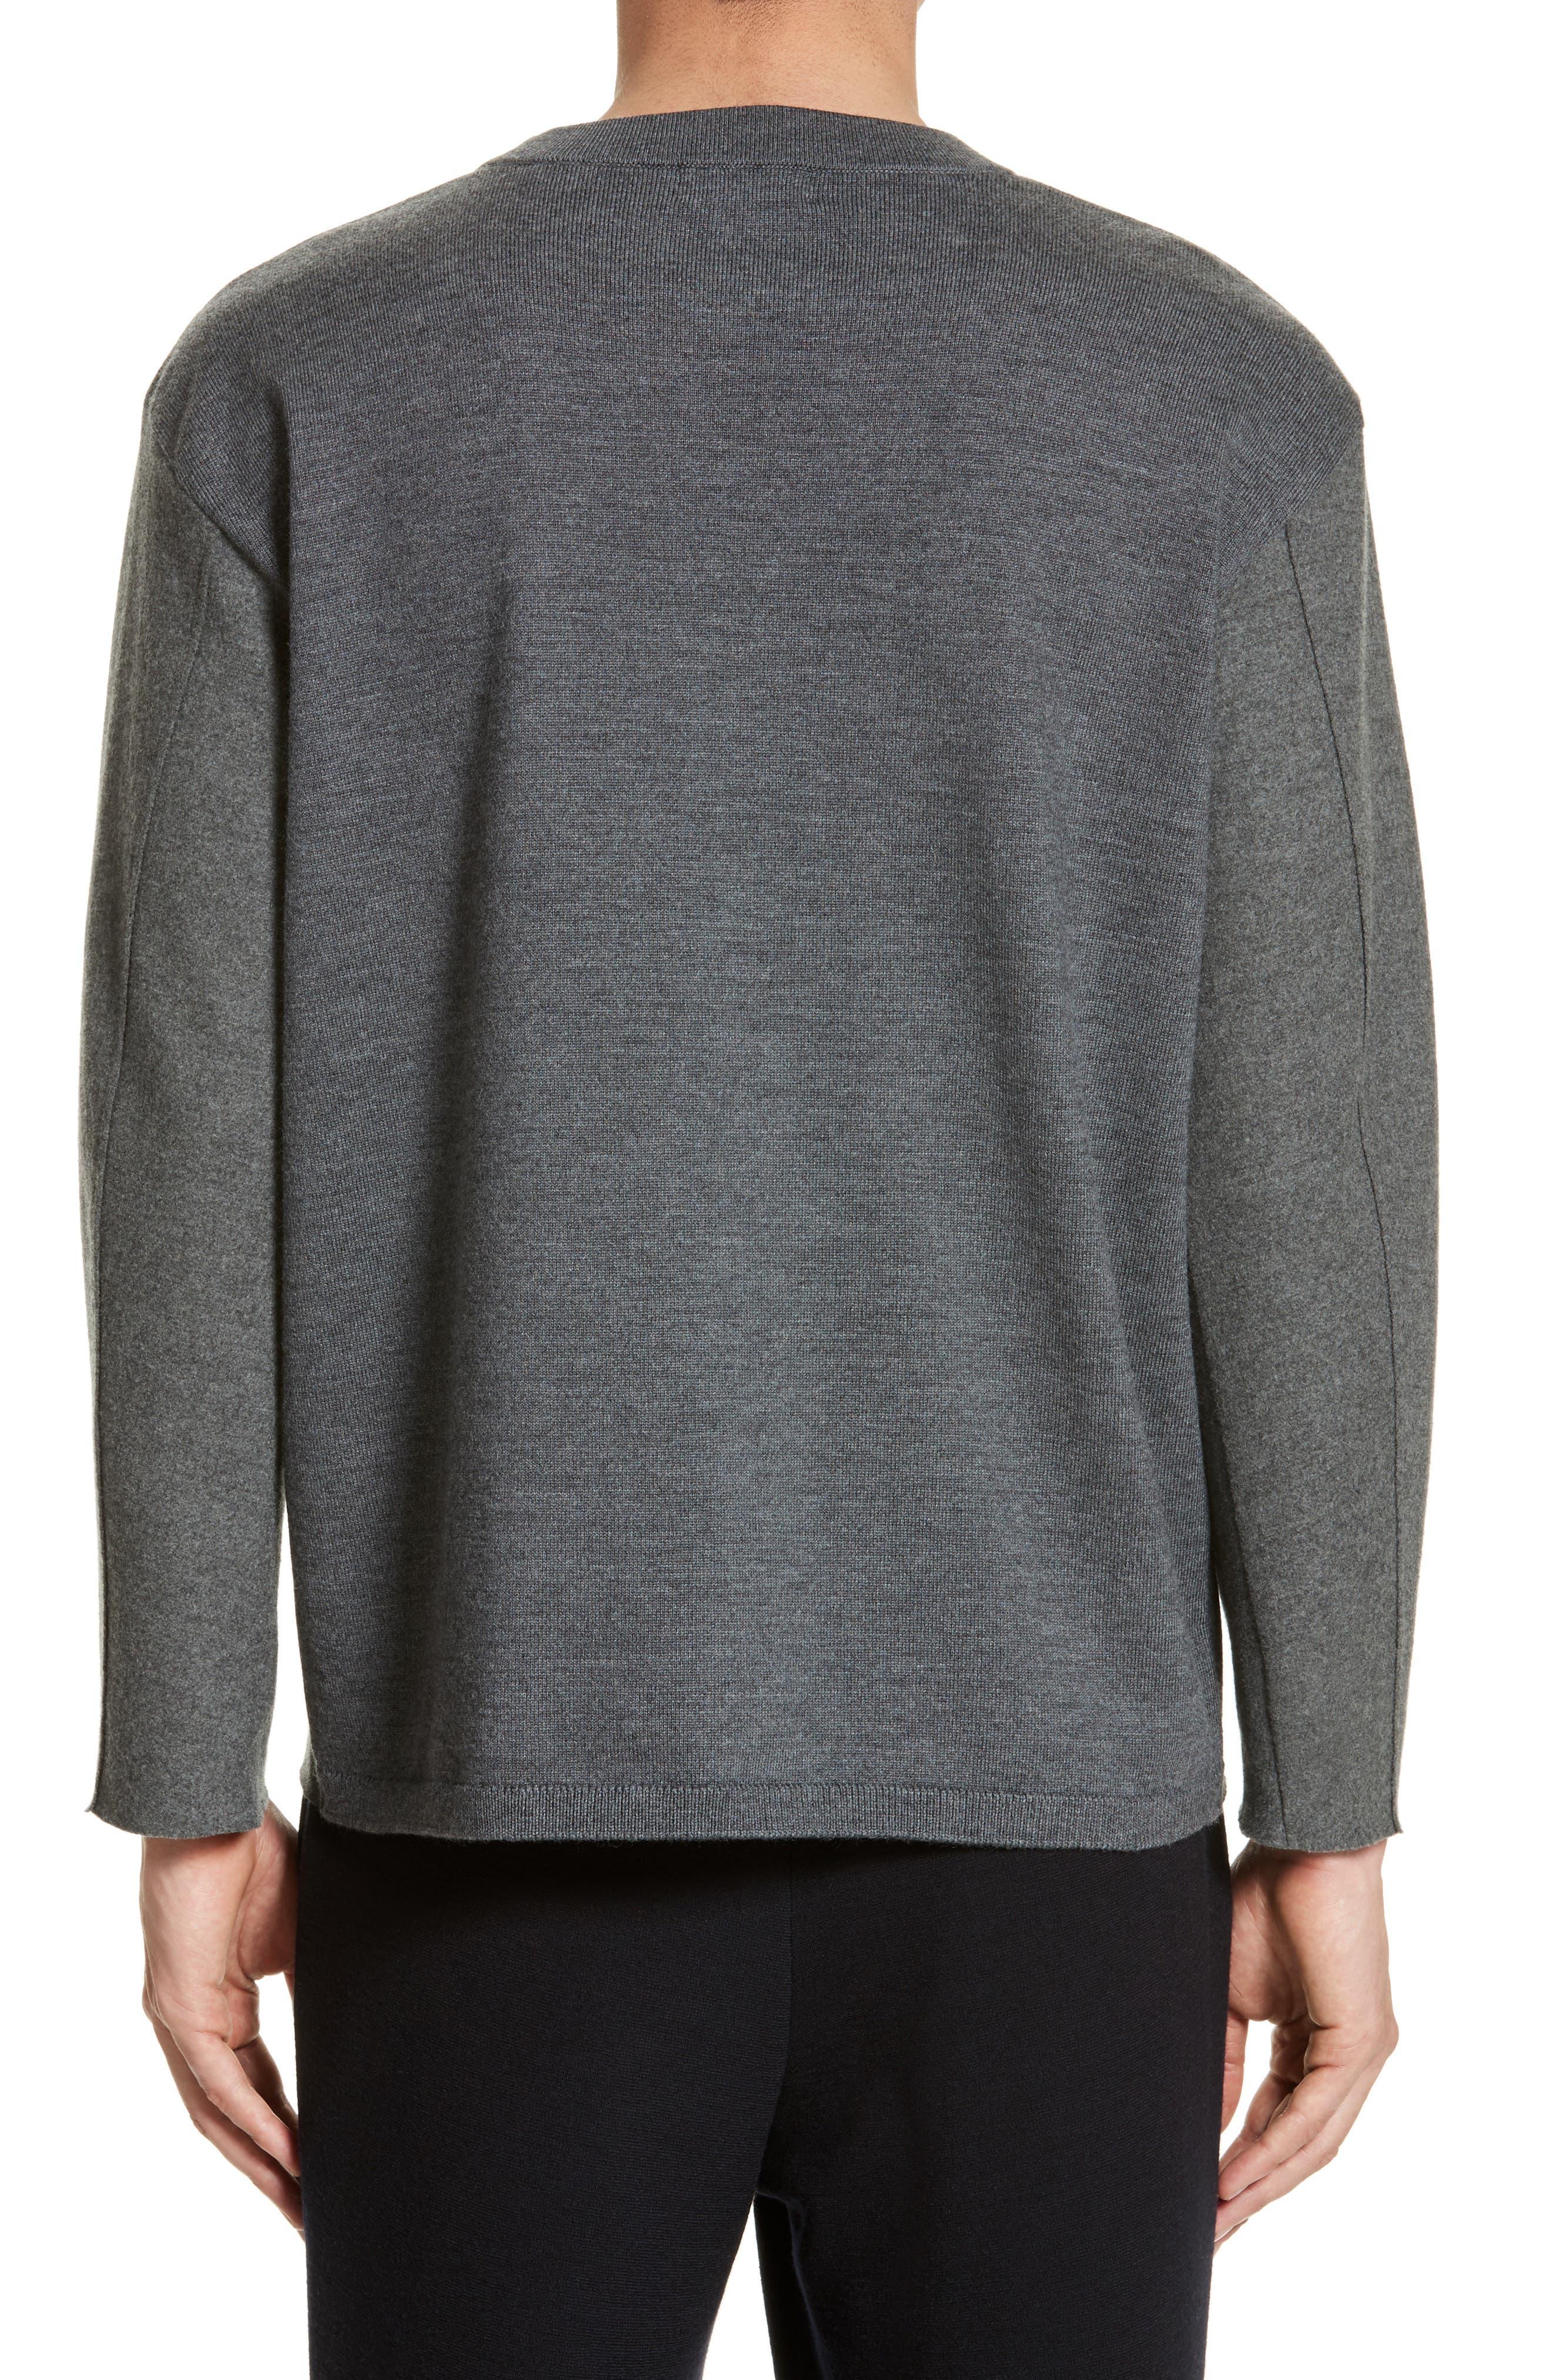 Hyper Compress Sweatshirt,                             Alternate thumbnail 2, color,                             020